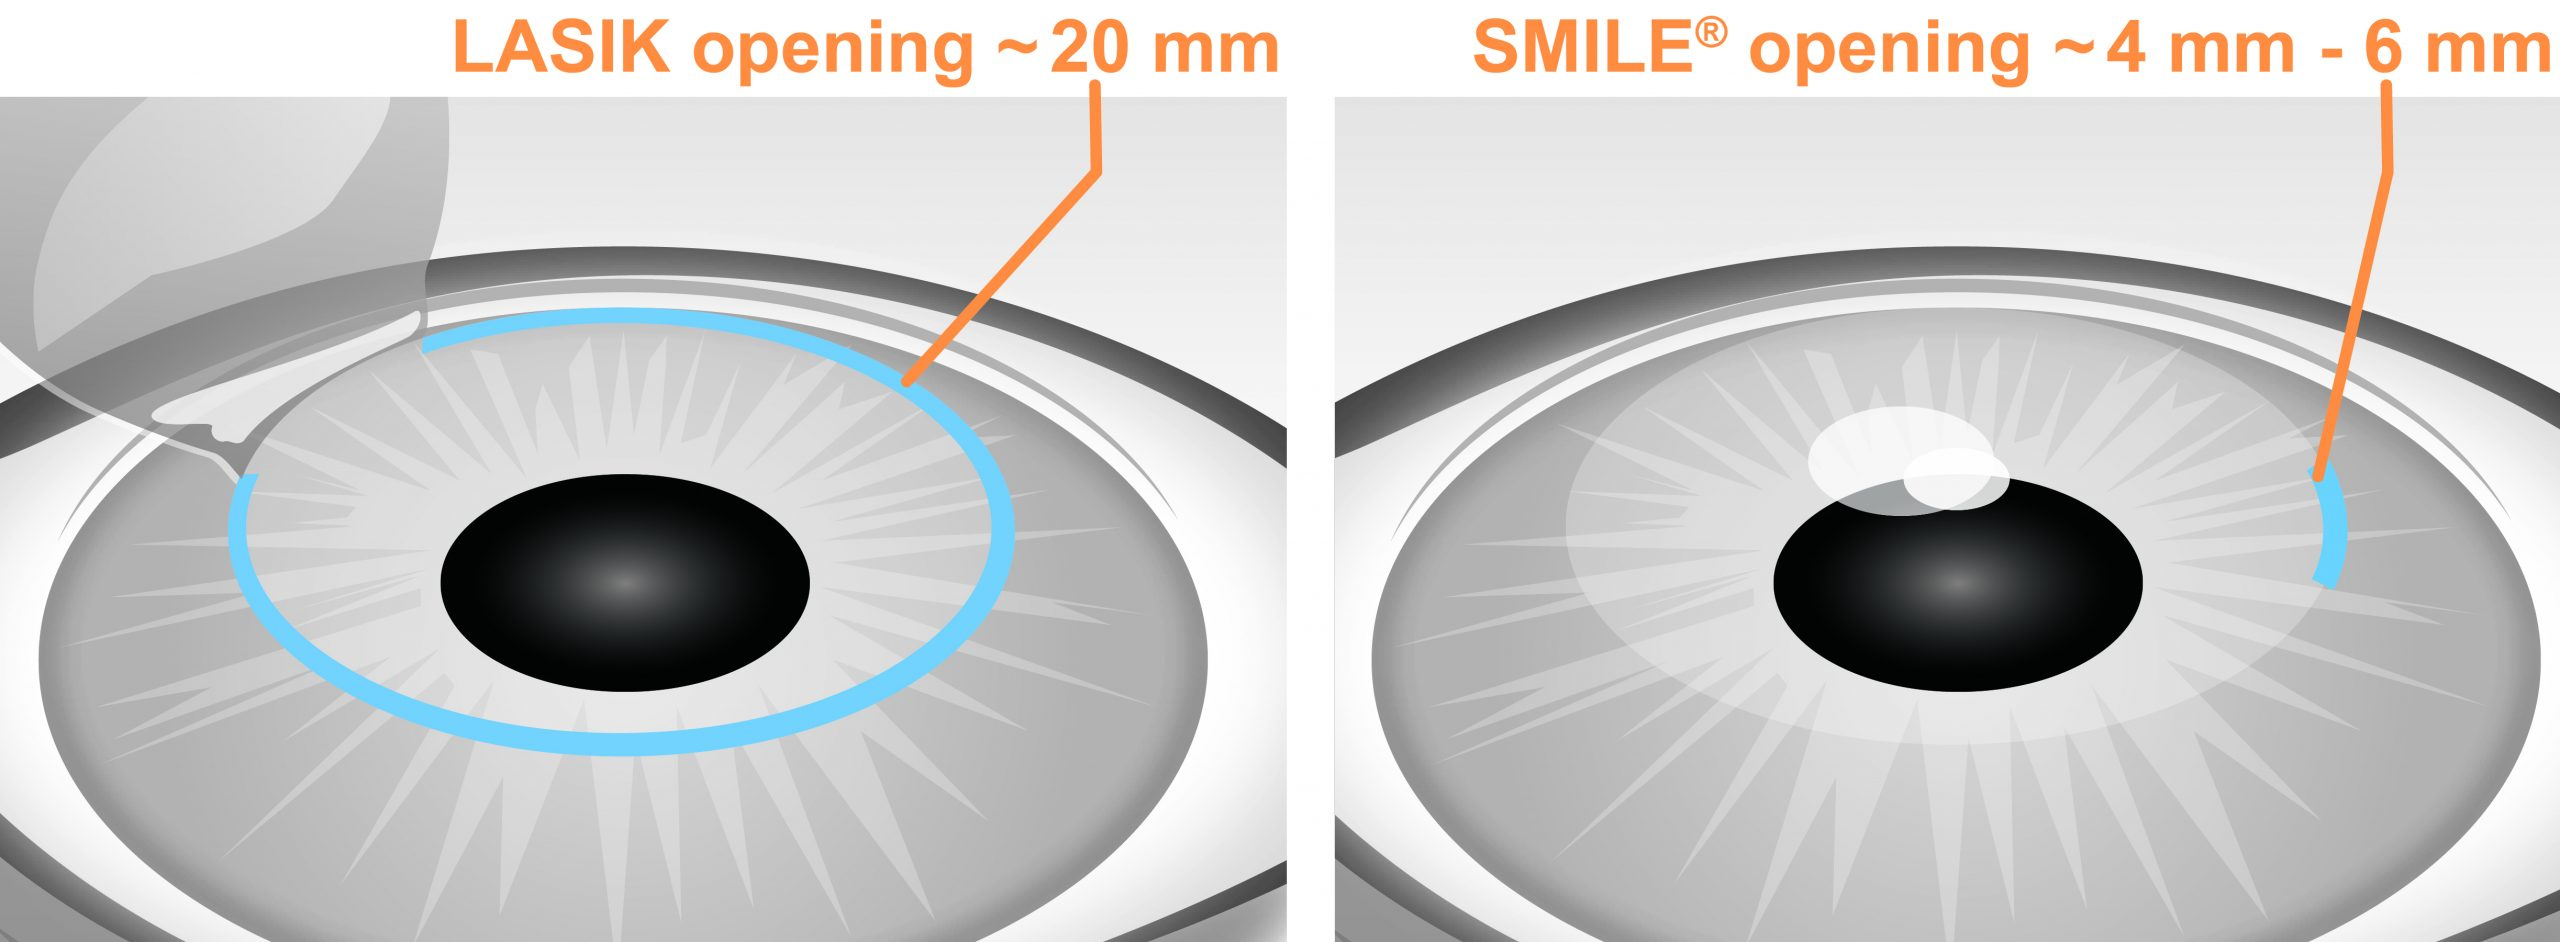 Smile Laser Eye Surgery Near Me